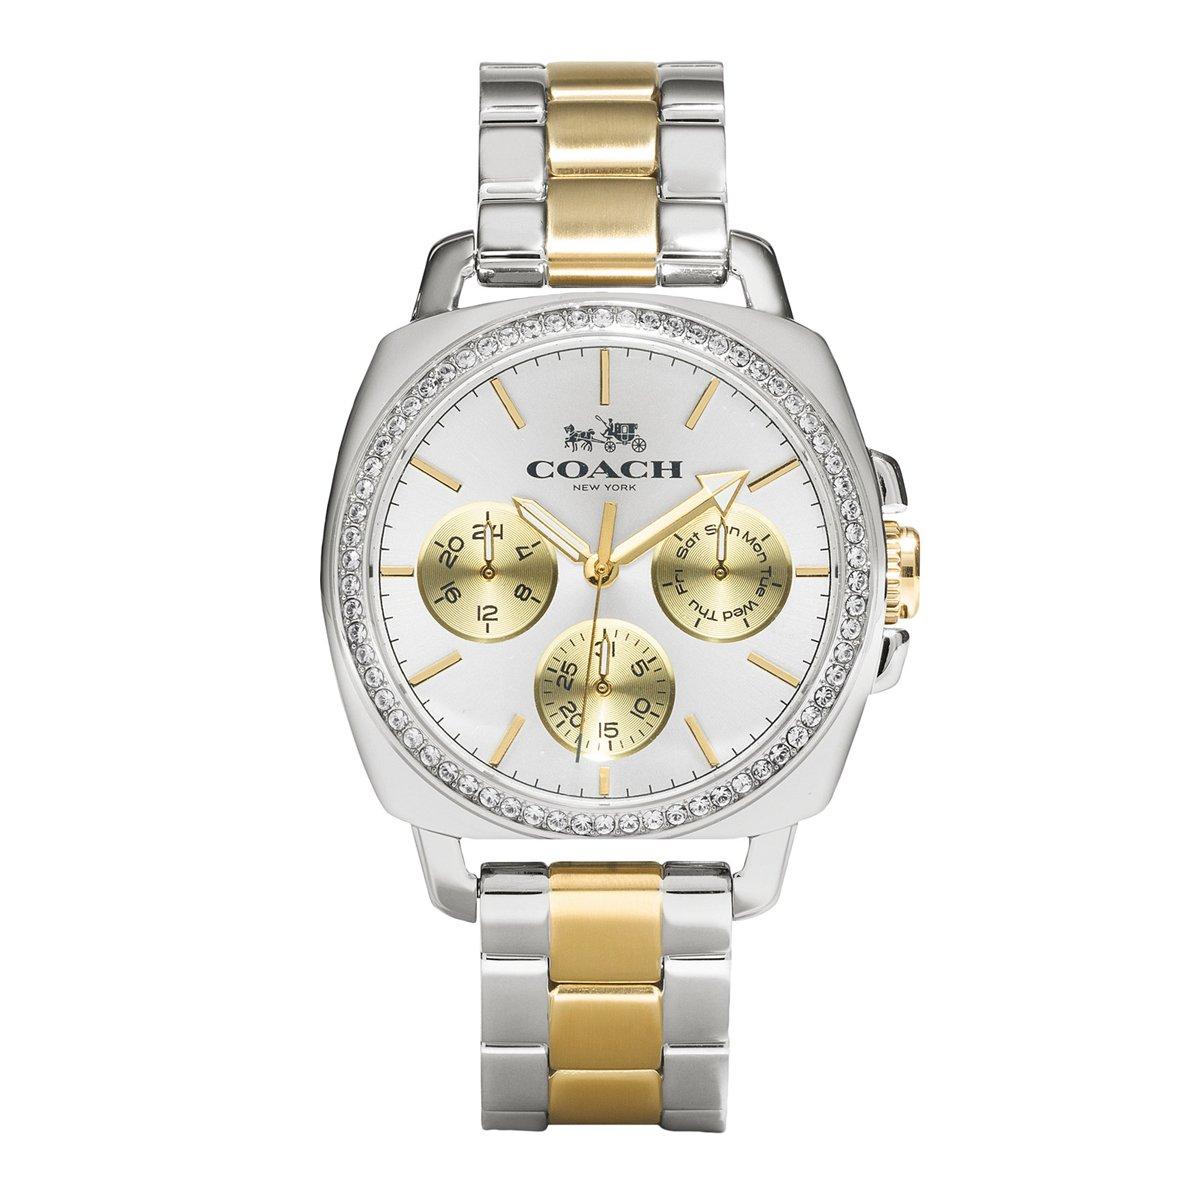 Amazon.com: Coach novio de la mujer 40 mm pulsera reloj dos ...